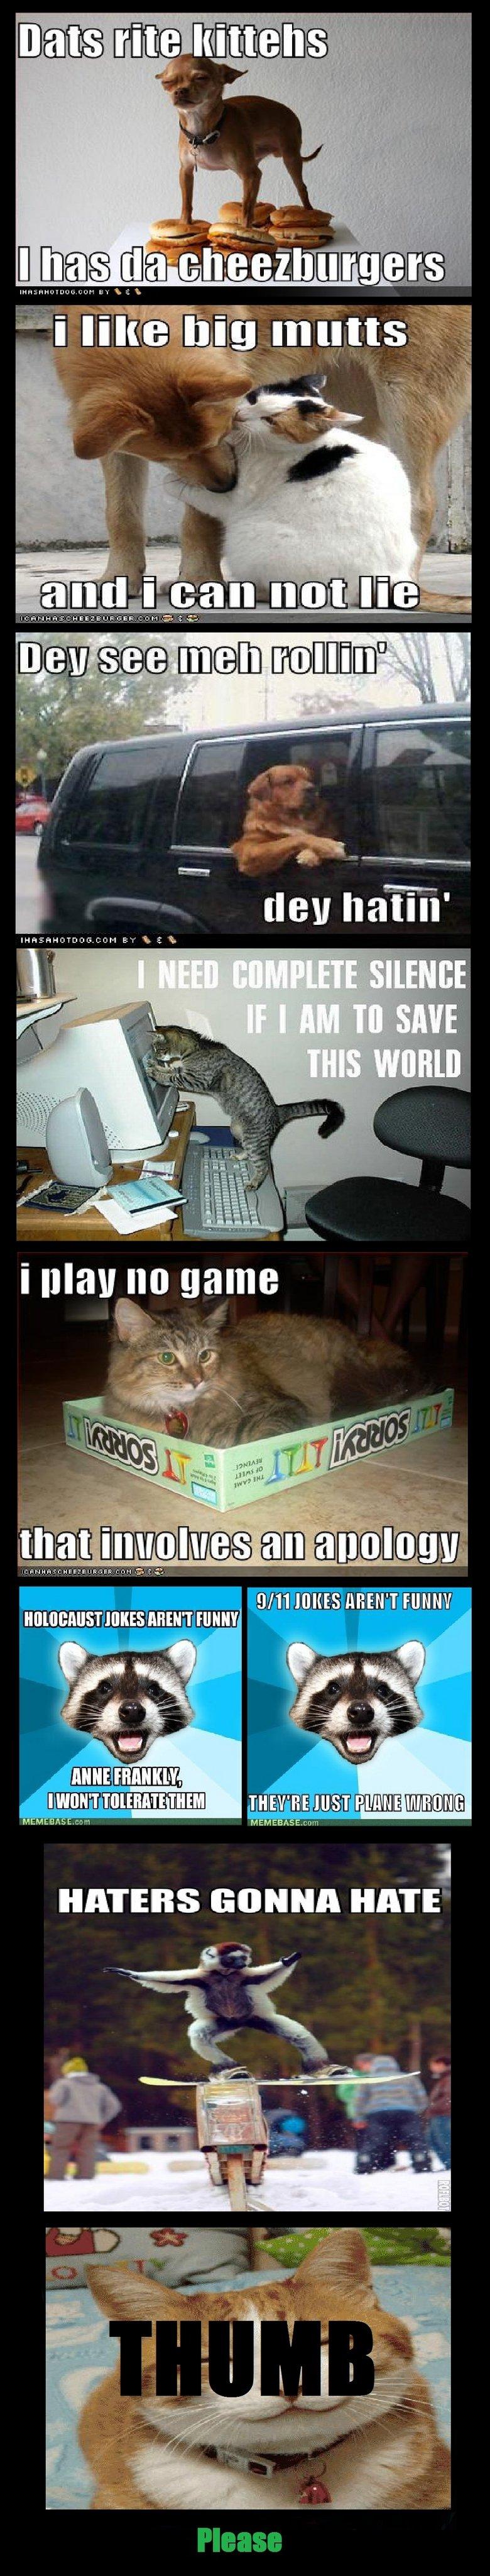 Animal humor comp. enjoy. MEMEBASE. cnm HINDI]! HATE animal humor comp im doin your Mom funny cat Dog Raccoon haers